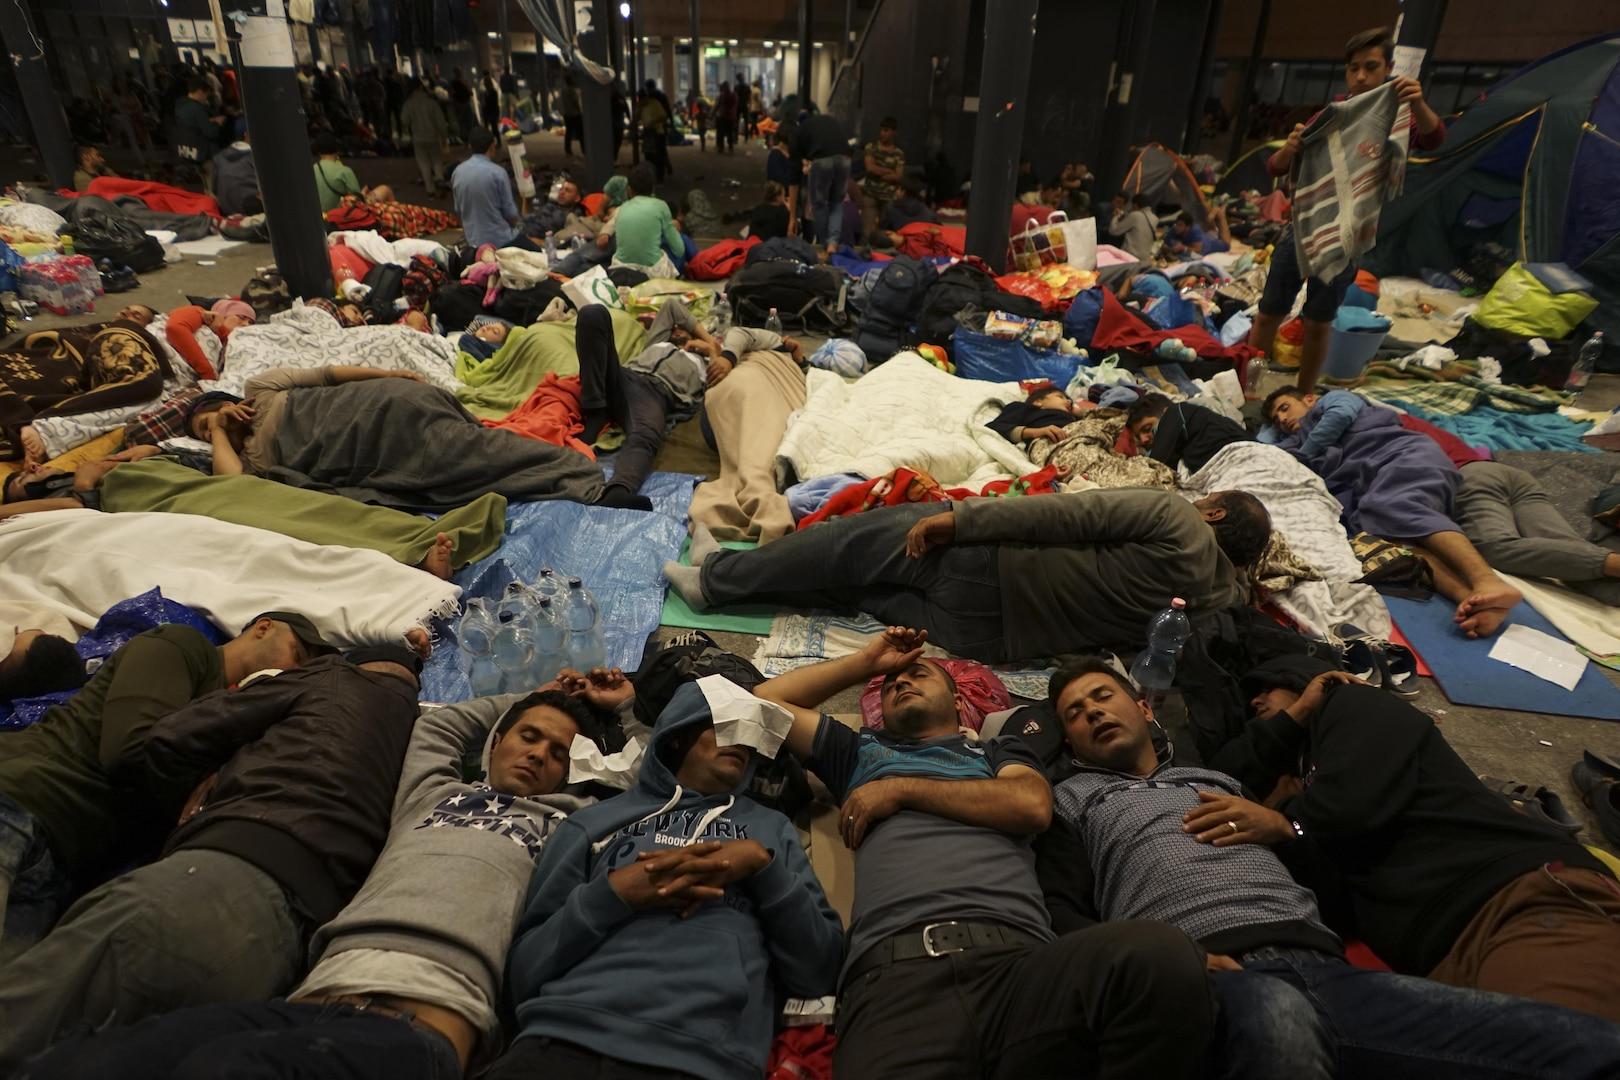 Syrian refugees having rest at the floor of Keleti railway station. Refugee crisis. Budapest, Hungary, Central Europe, 5 September 2015.